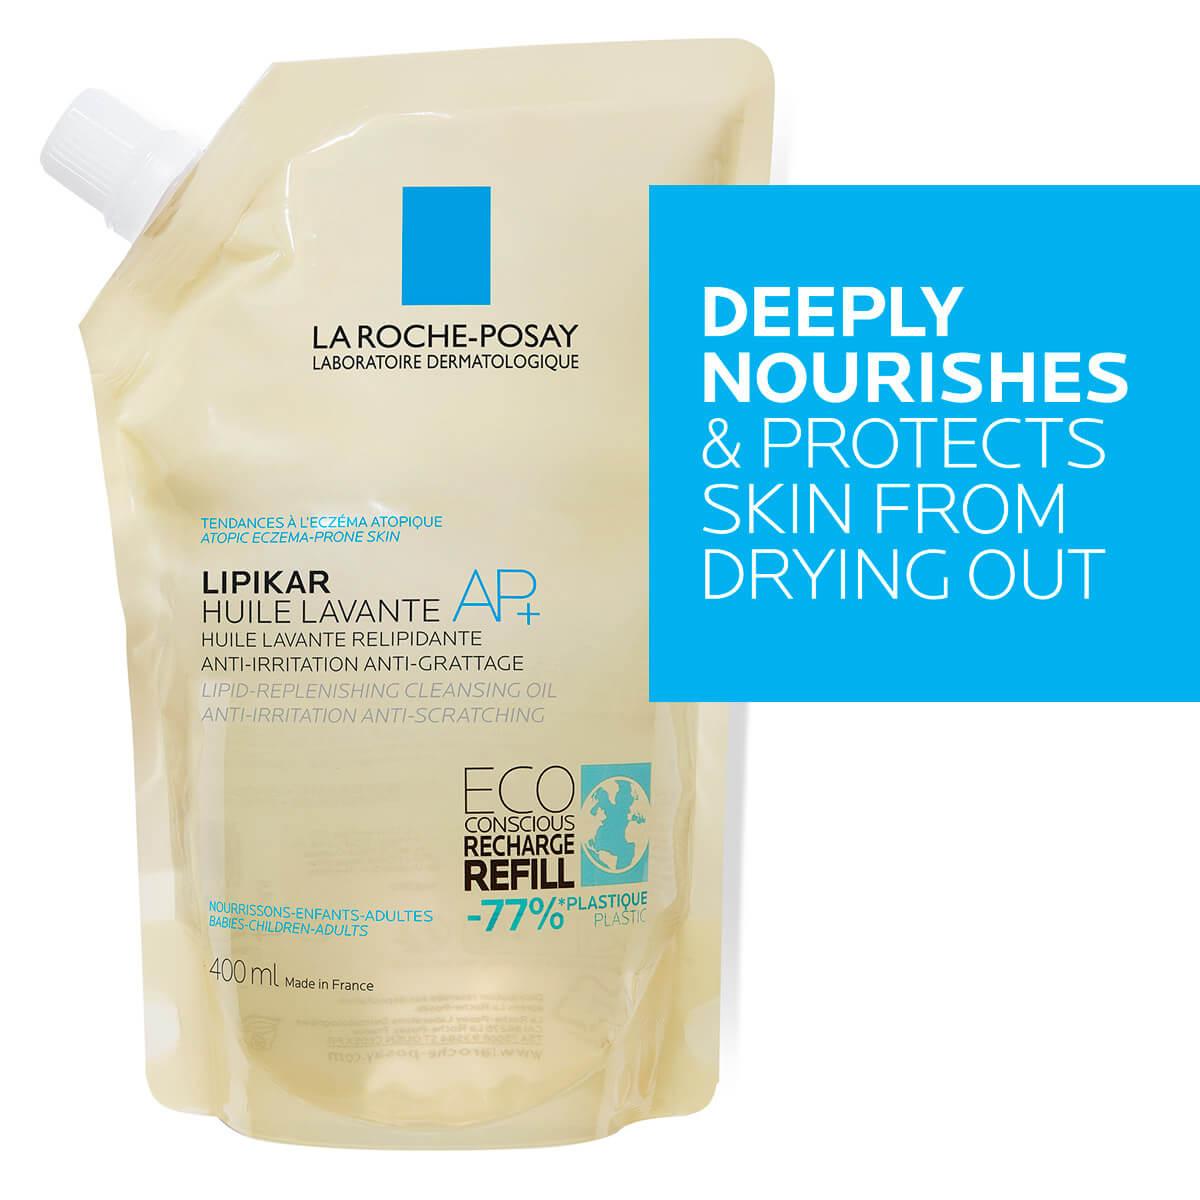 LaRochePosay-Product-Eczema-Lipikar-Eco-conscious-Refill-CleansingOilAP-400ml-3337875735759-Zoomed-FLS